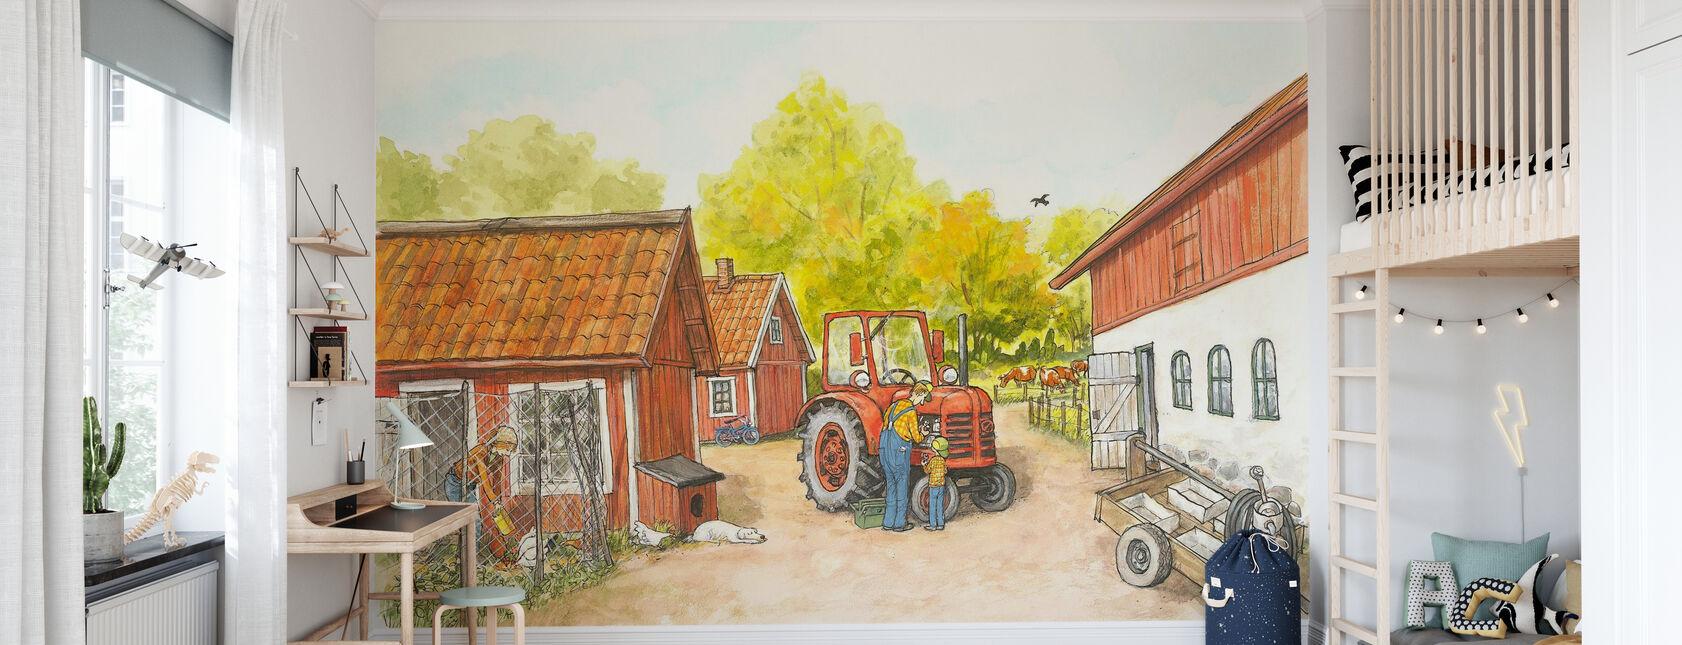 Mom Mu & Crow - The Farm - Wallpaper - Kids Room